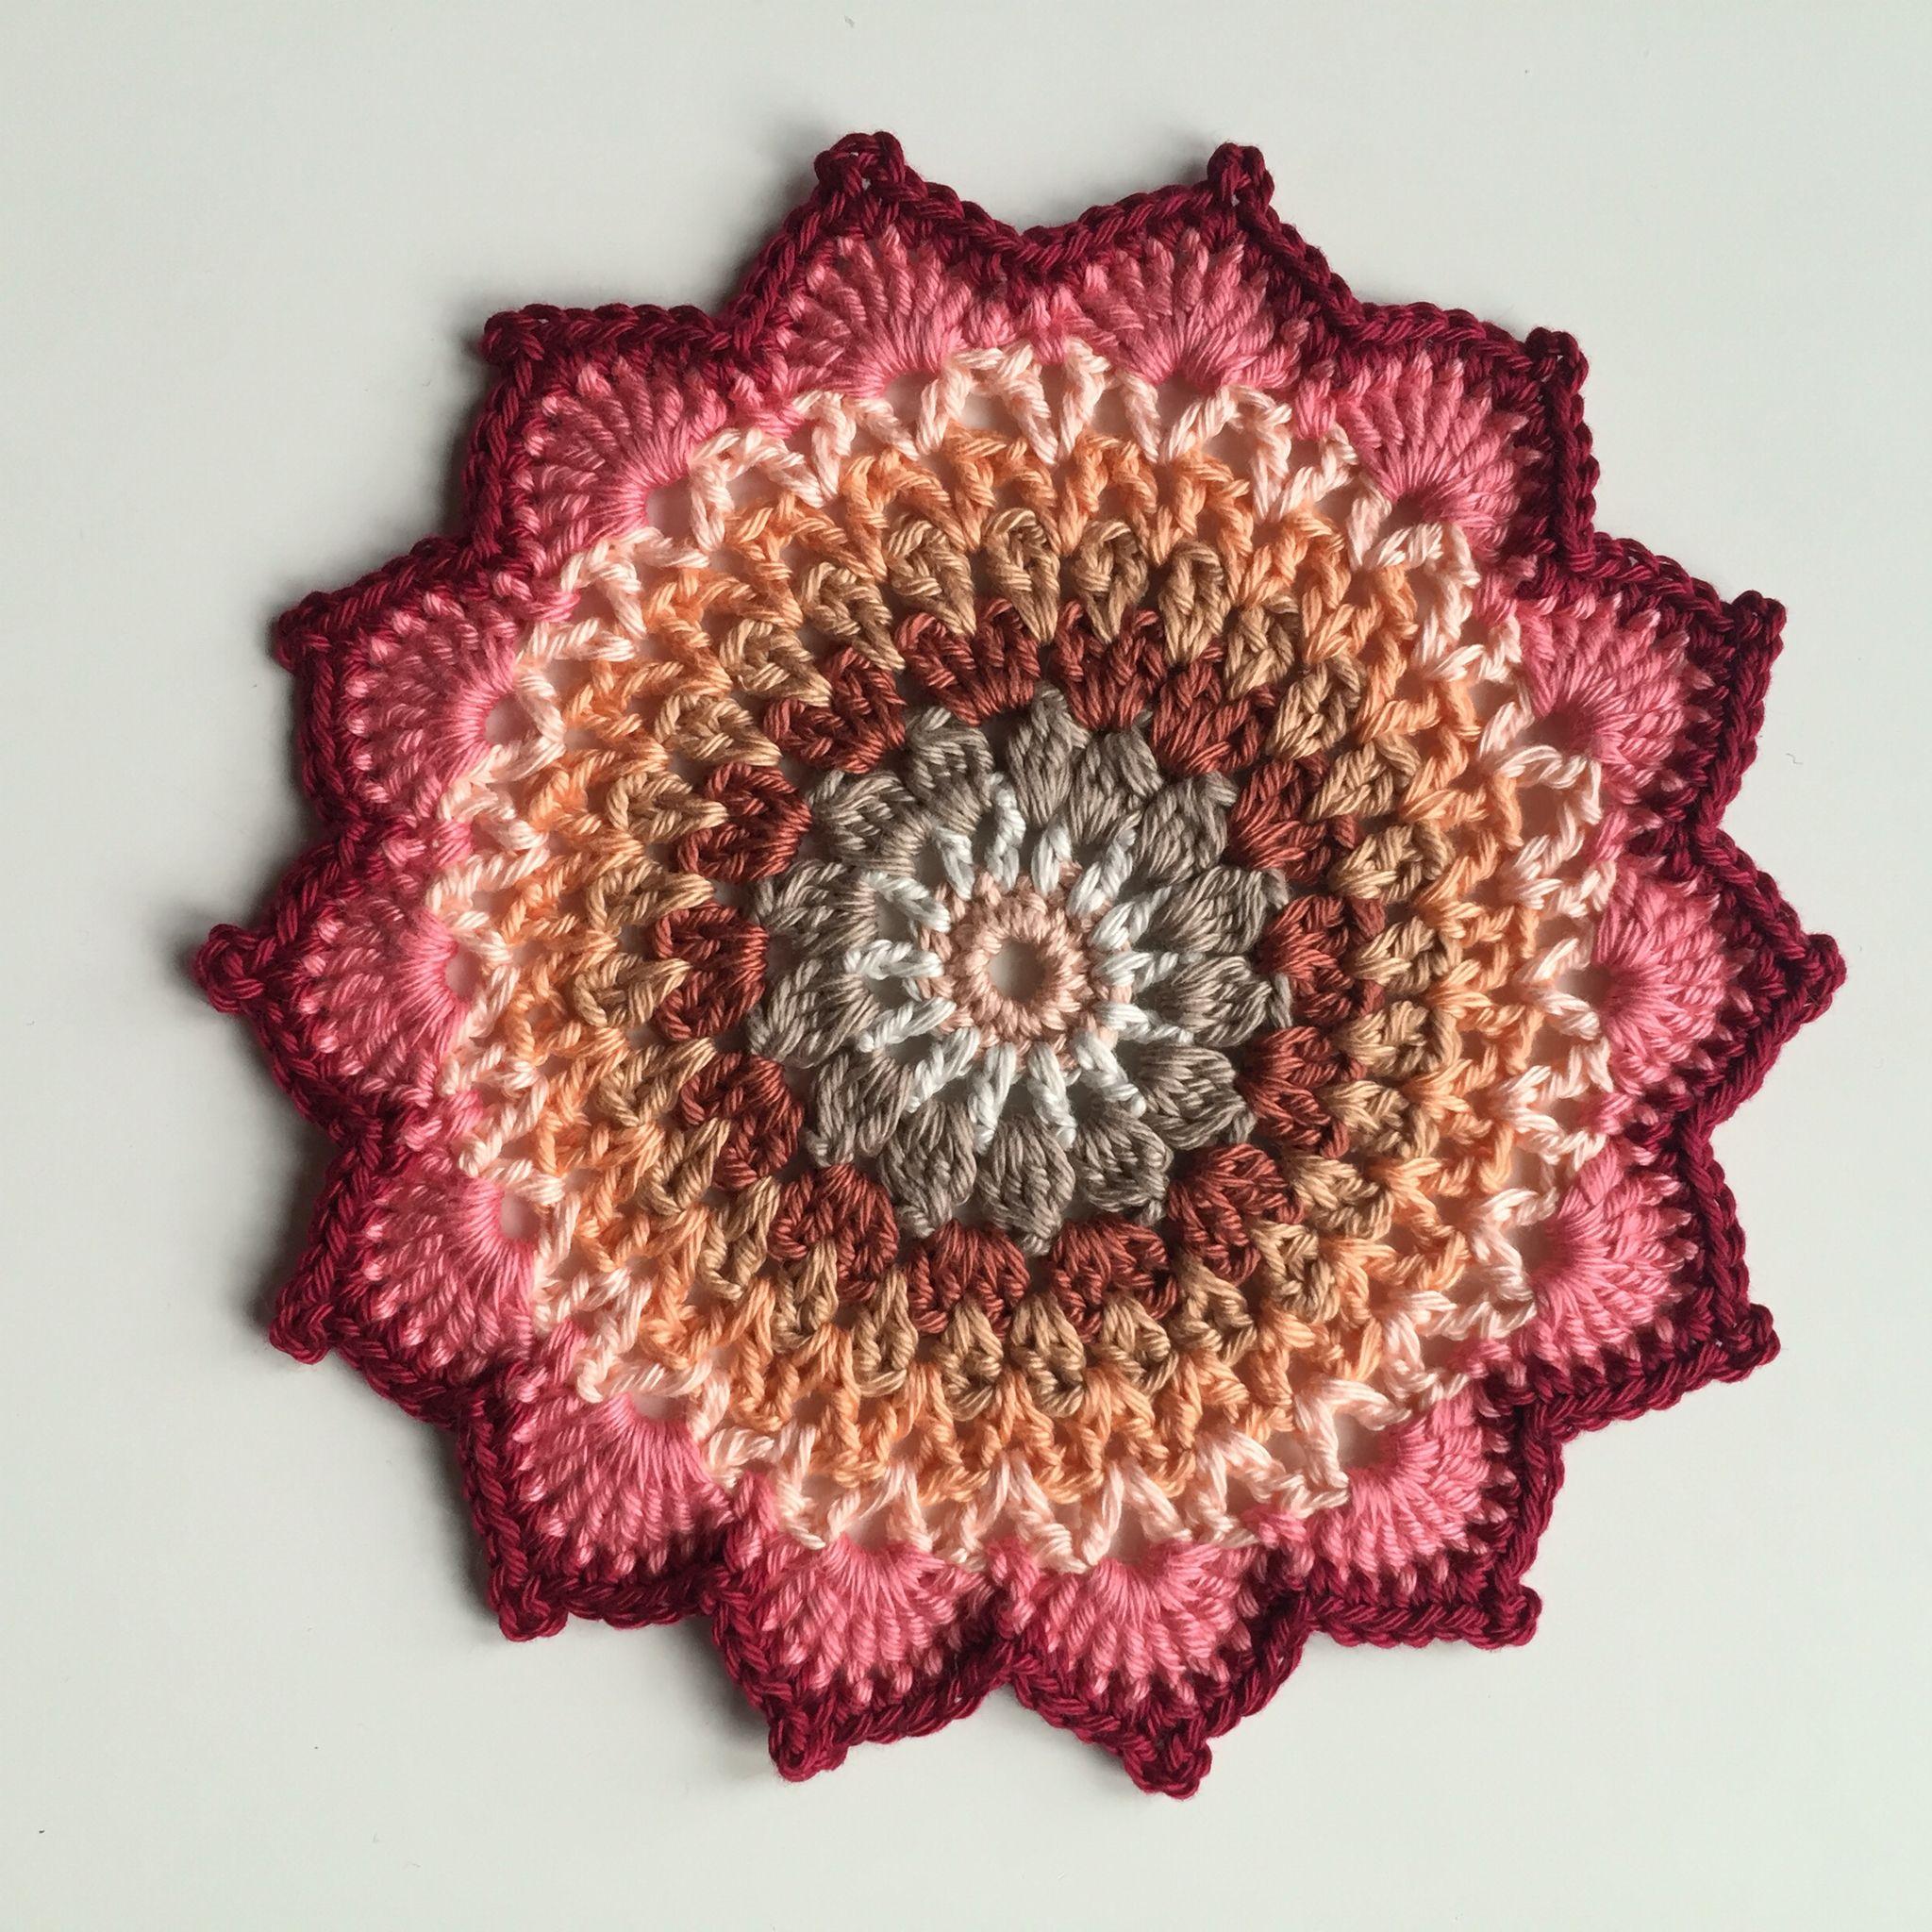 Mandala Haken Crochet Little Cherry Blossom Mandala Crochetmilan